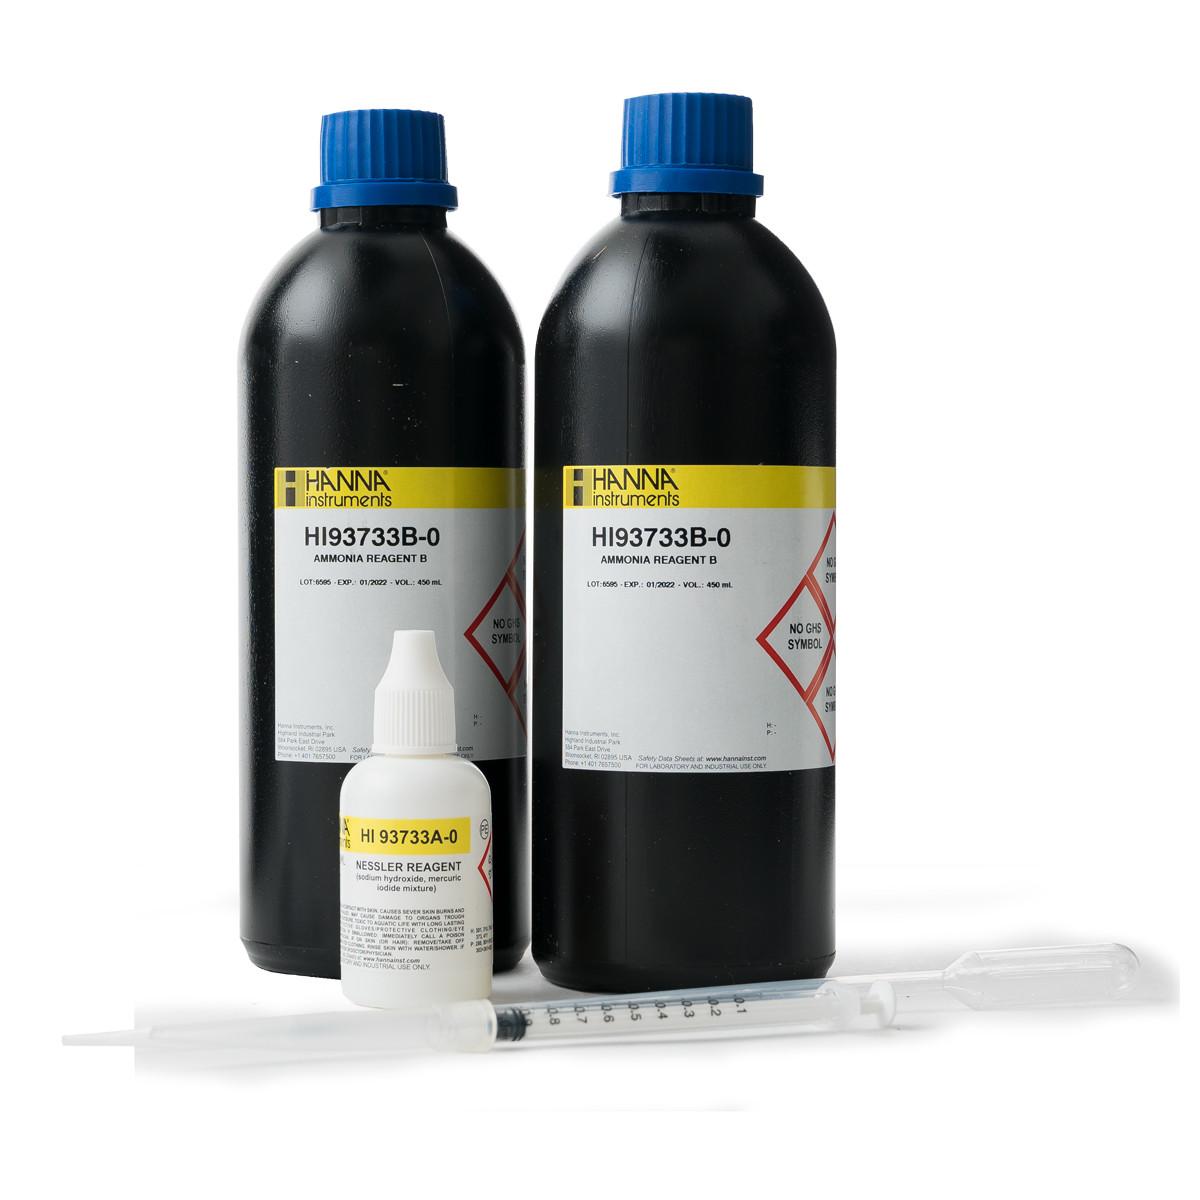 Ammonia High Range Reagents (100 tests)